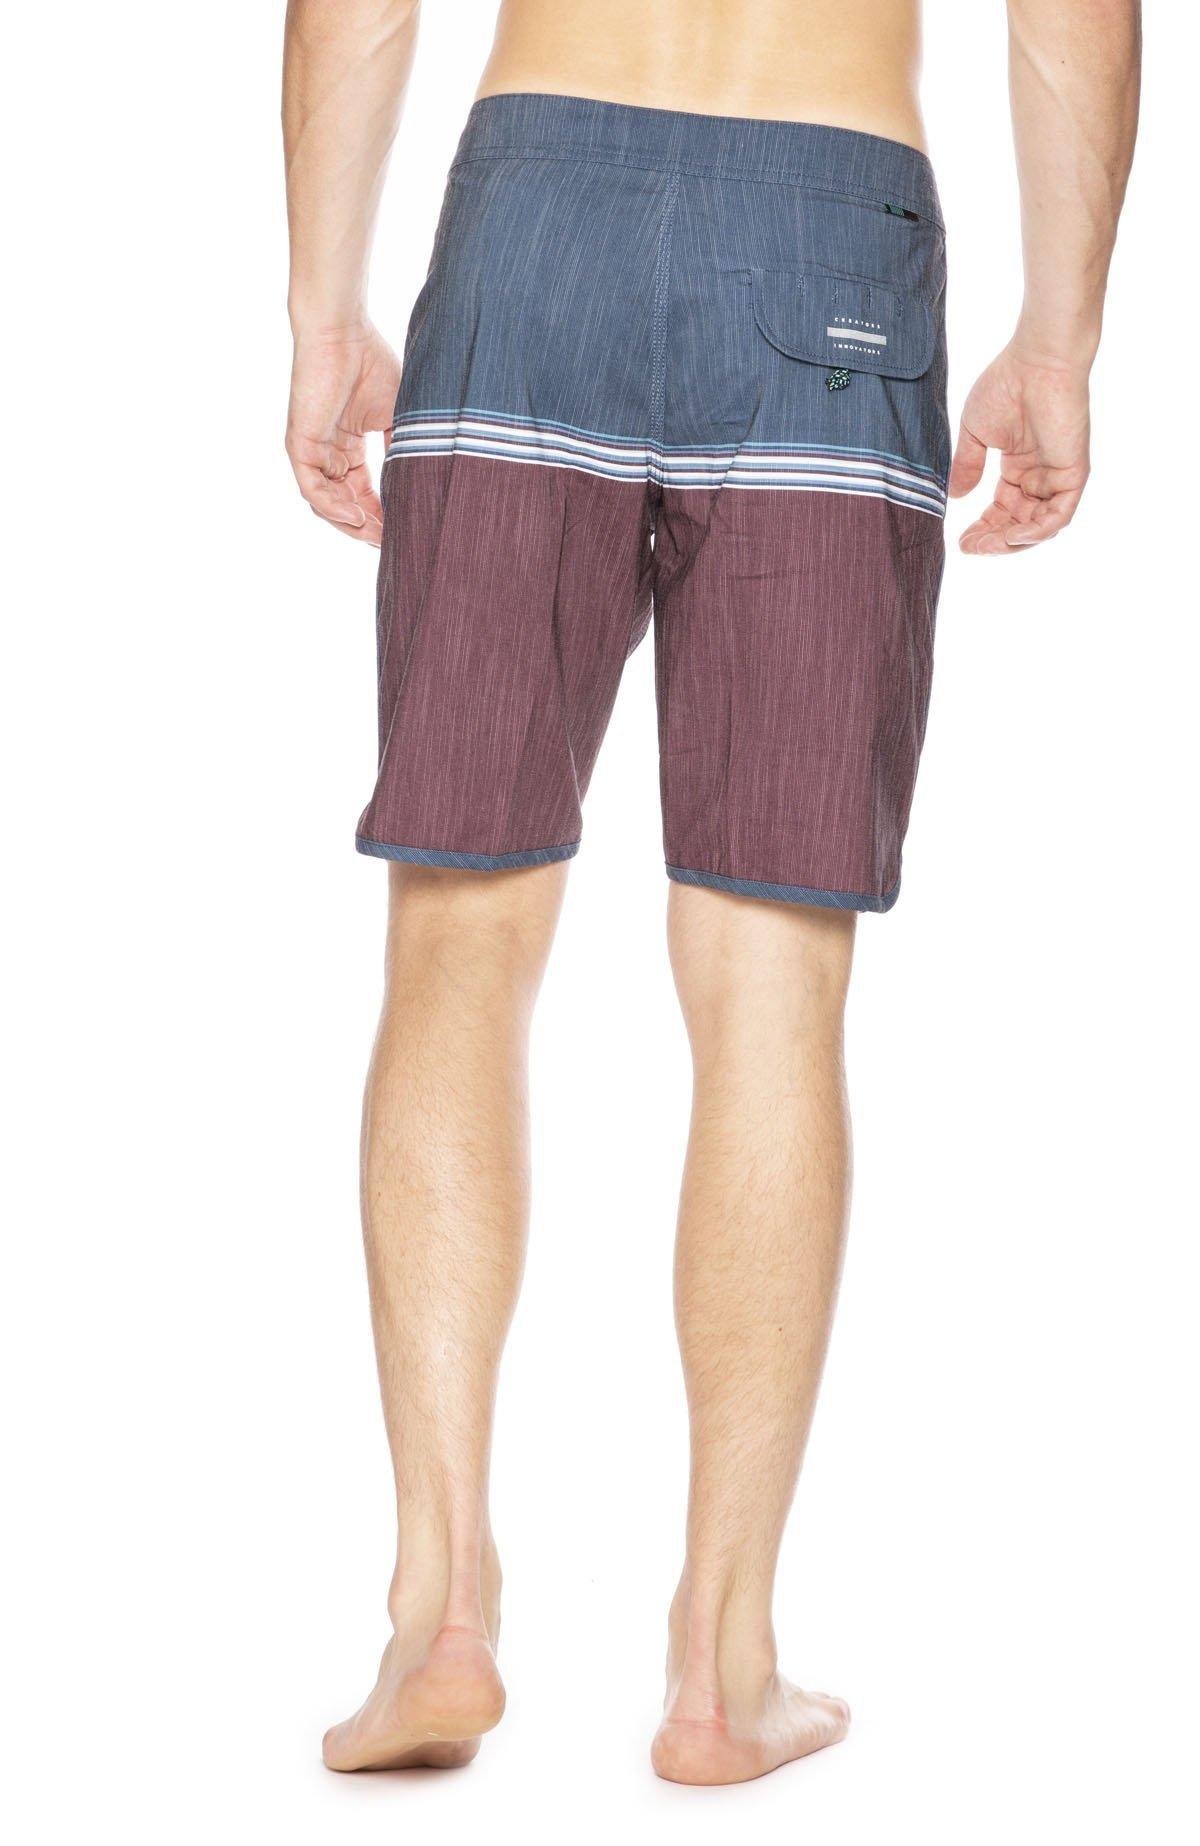 3a31e15329 Vissla Dredges Boardshort - Colorblock | Garmentory